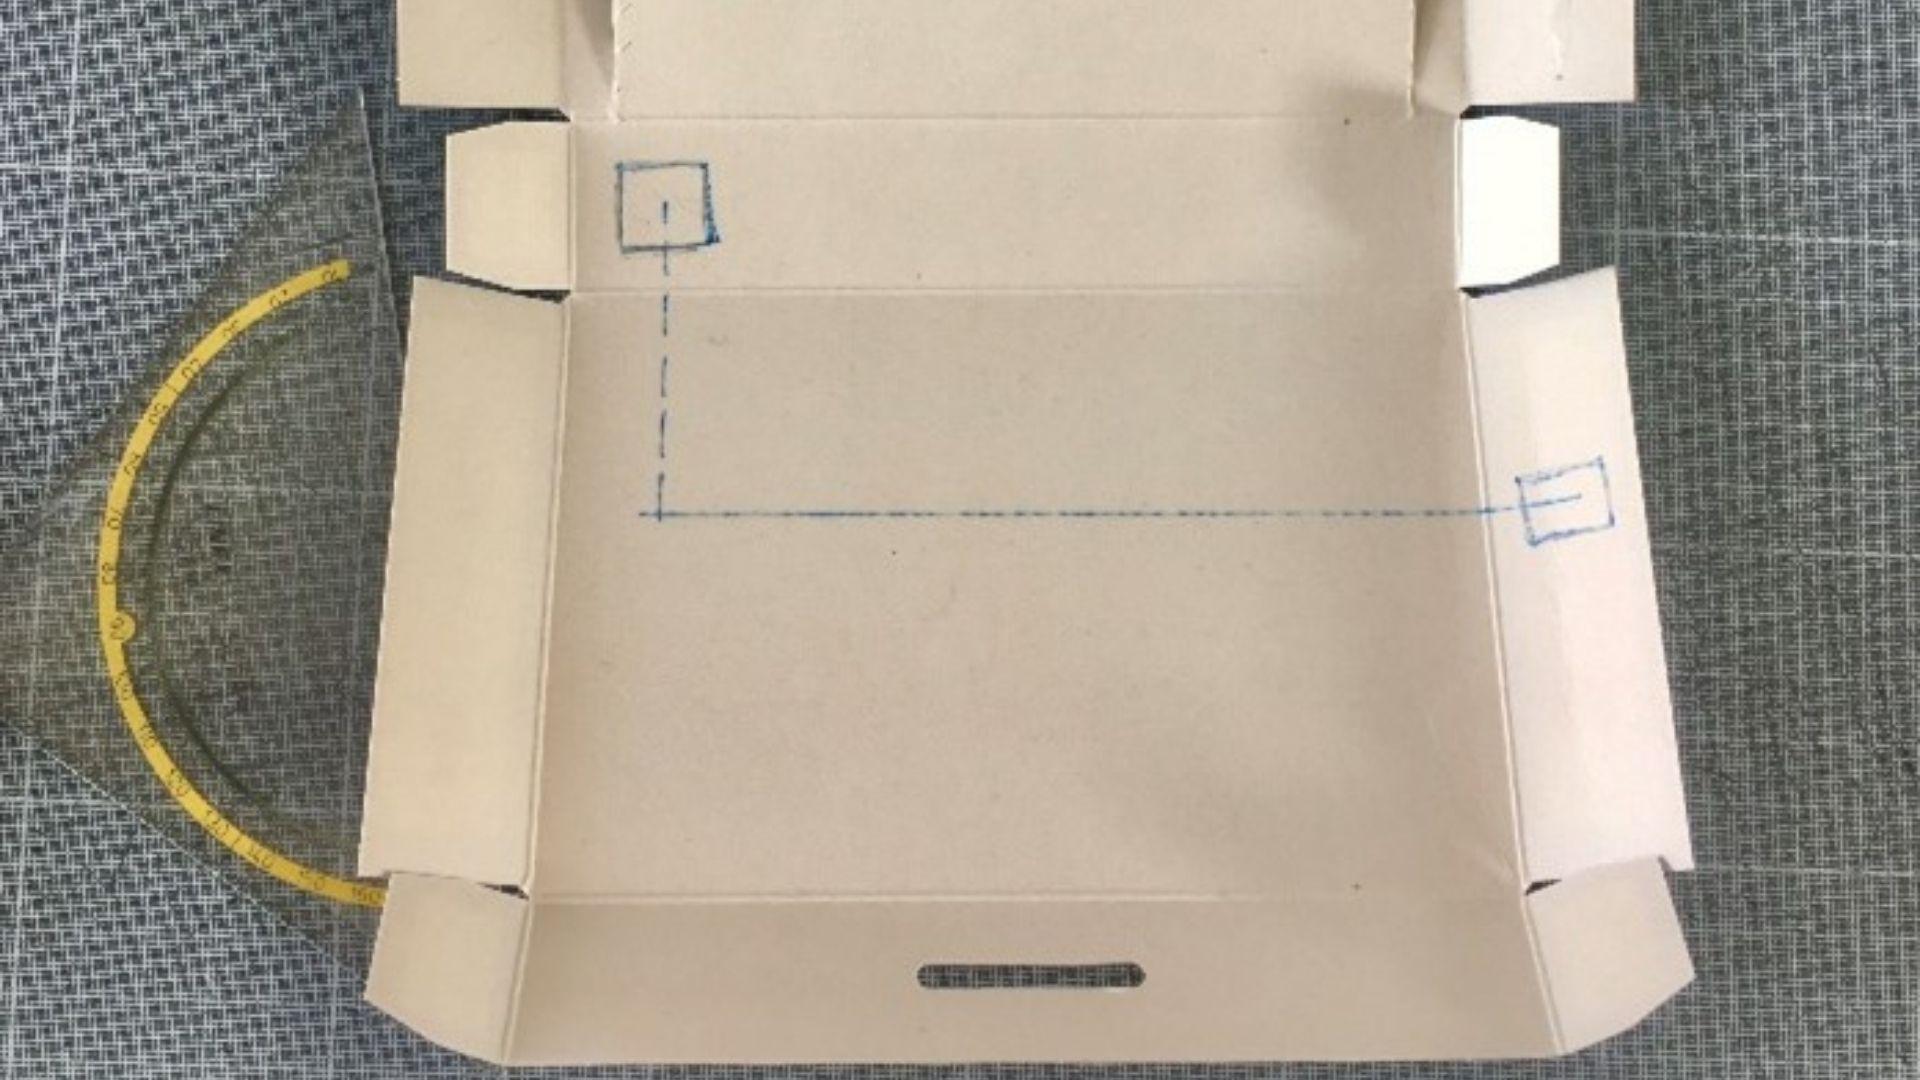 Spektrometer step 2